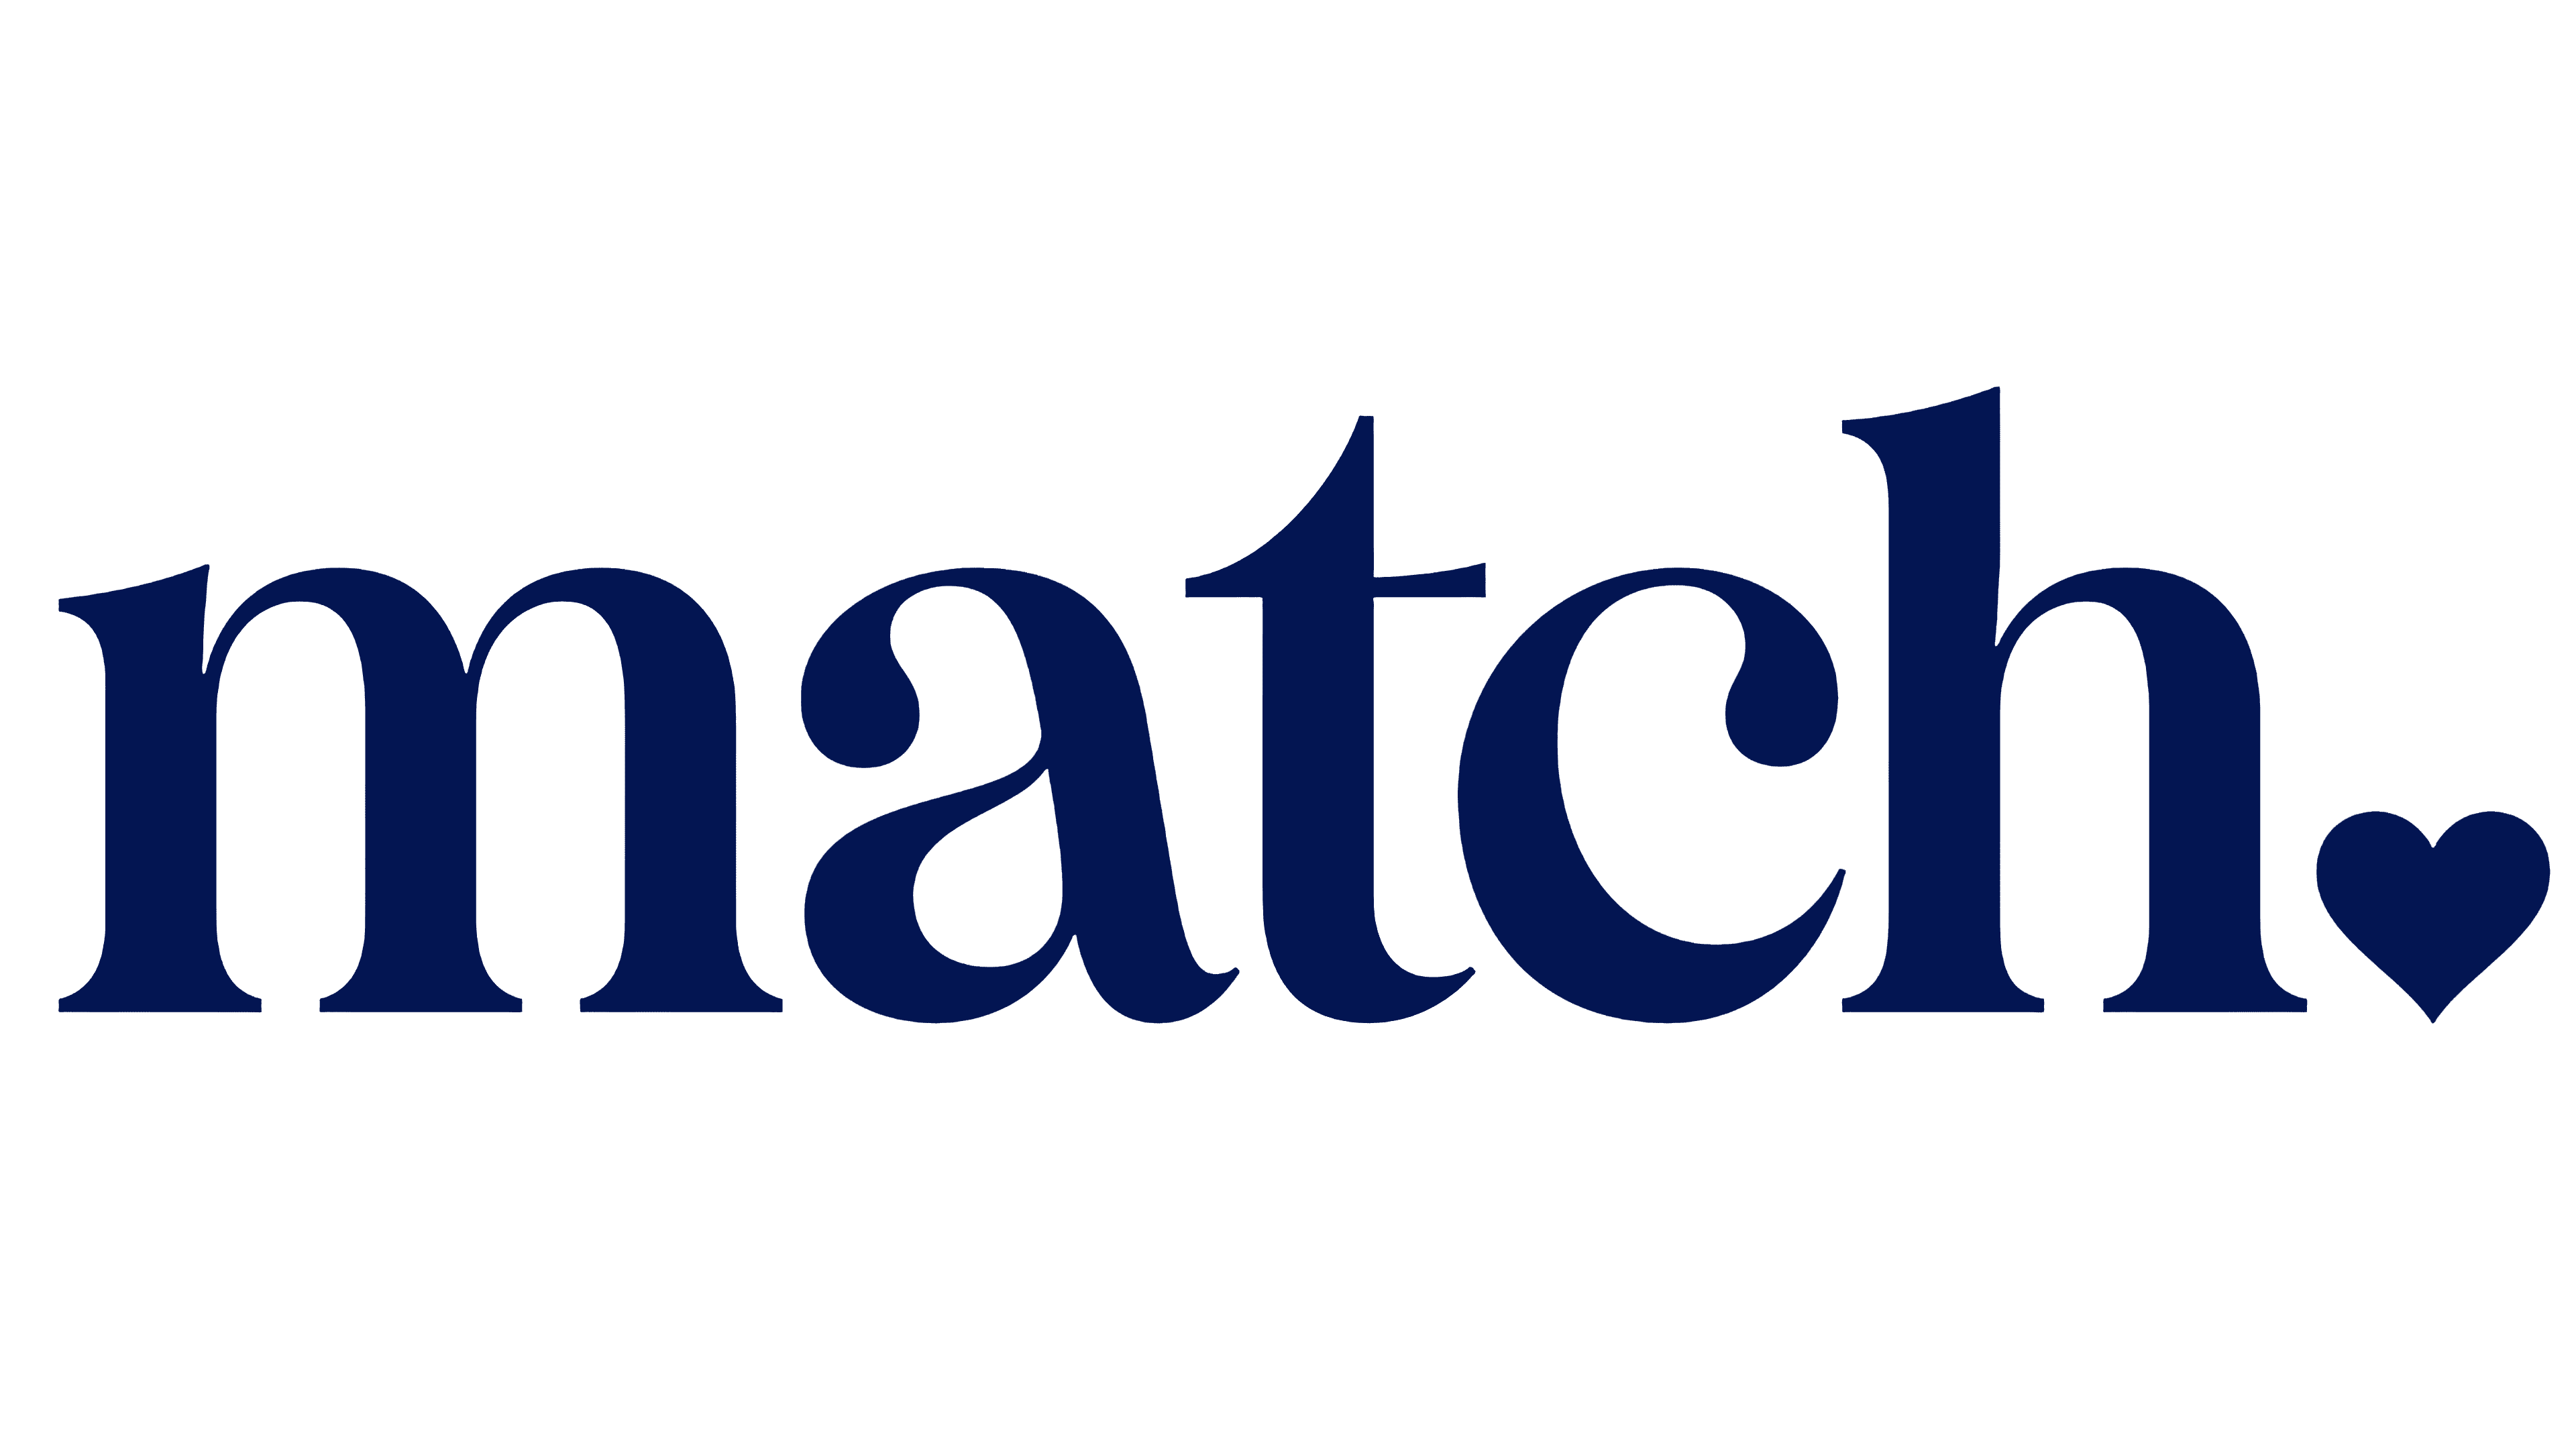 Match.com Review UK [Features, Price & Plans, Alternatives]